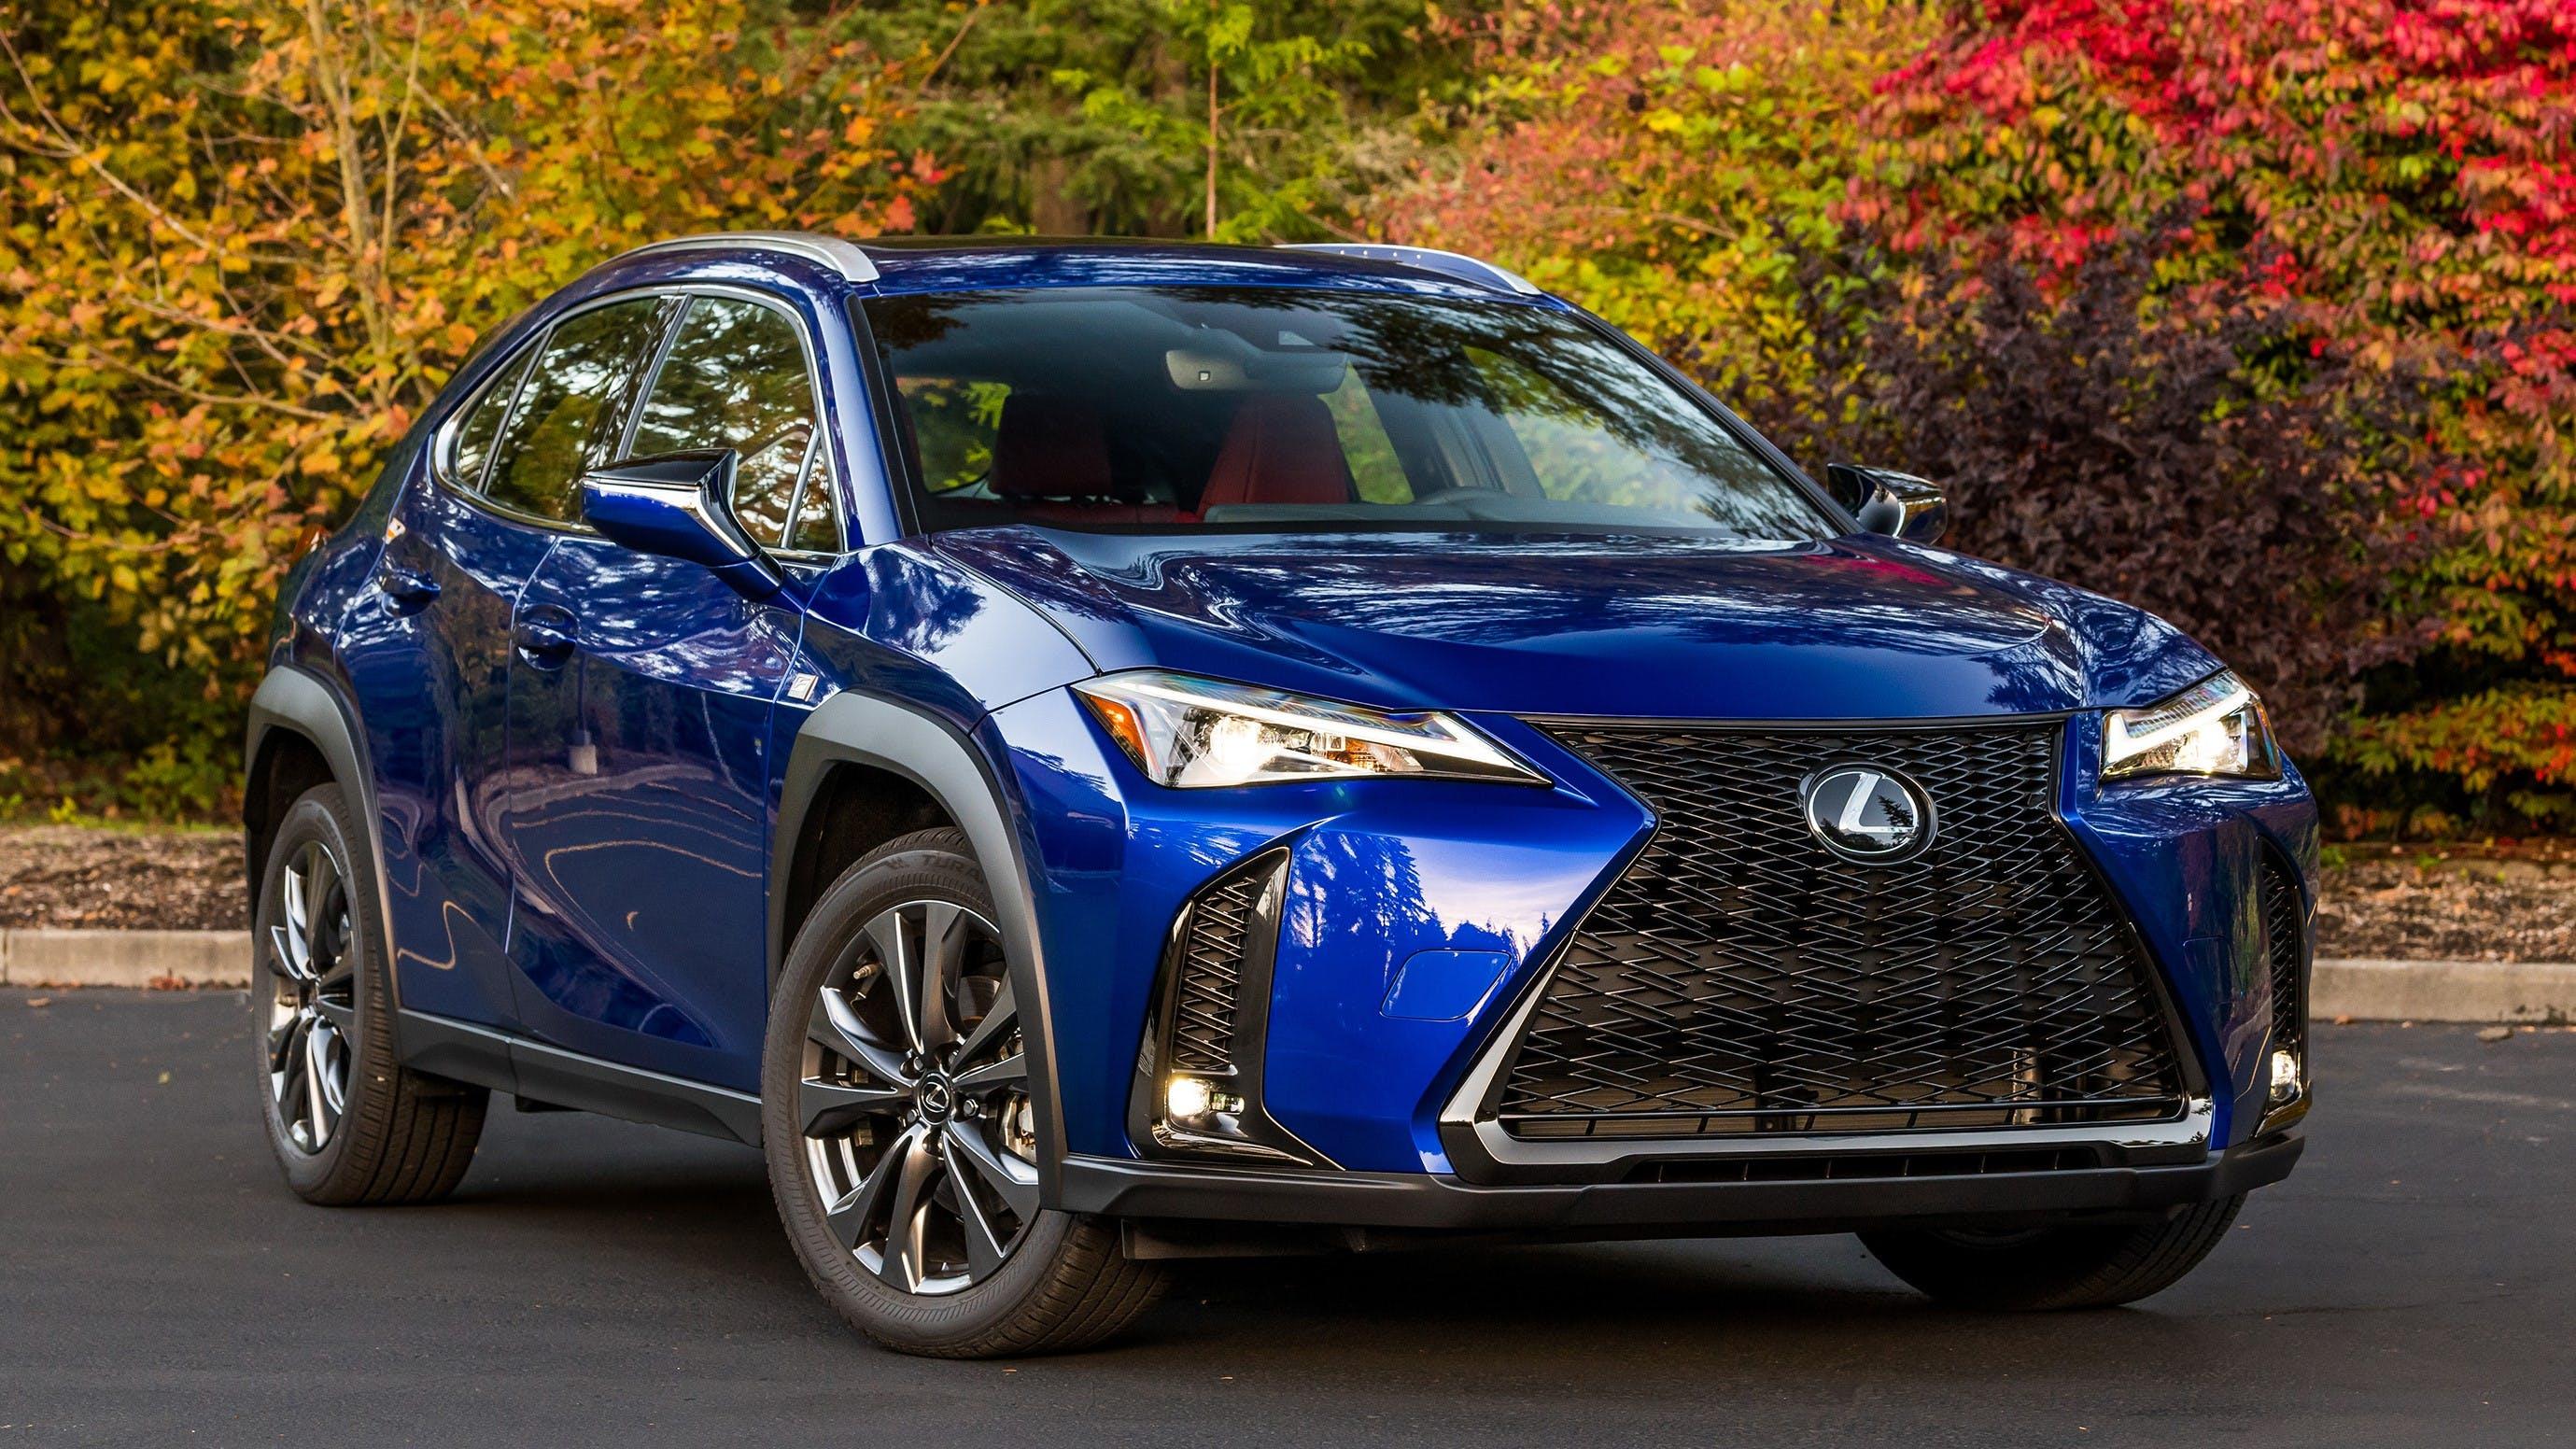 10 Cheapest Luxury SUVs of 2020